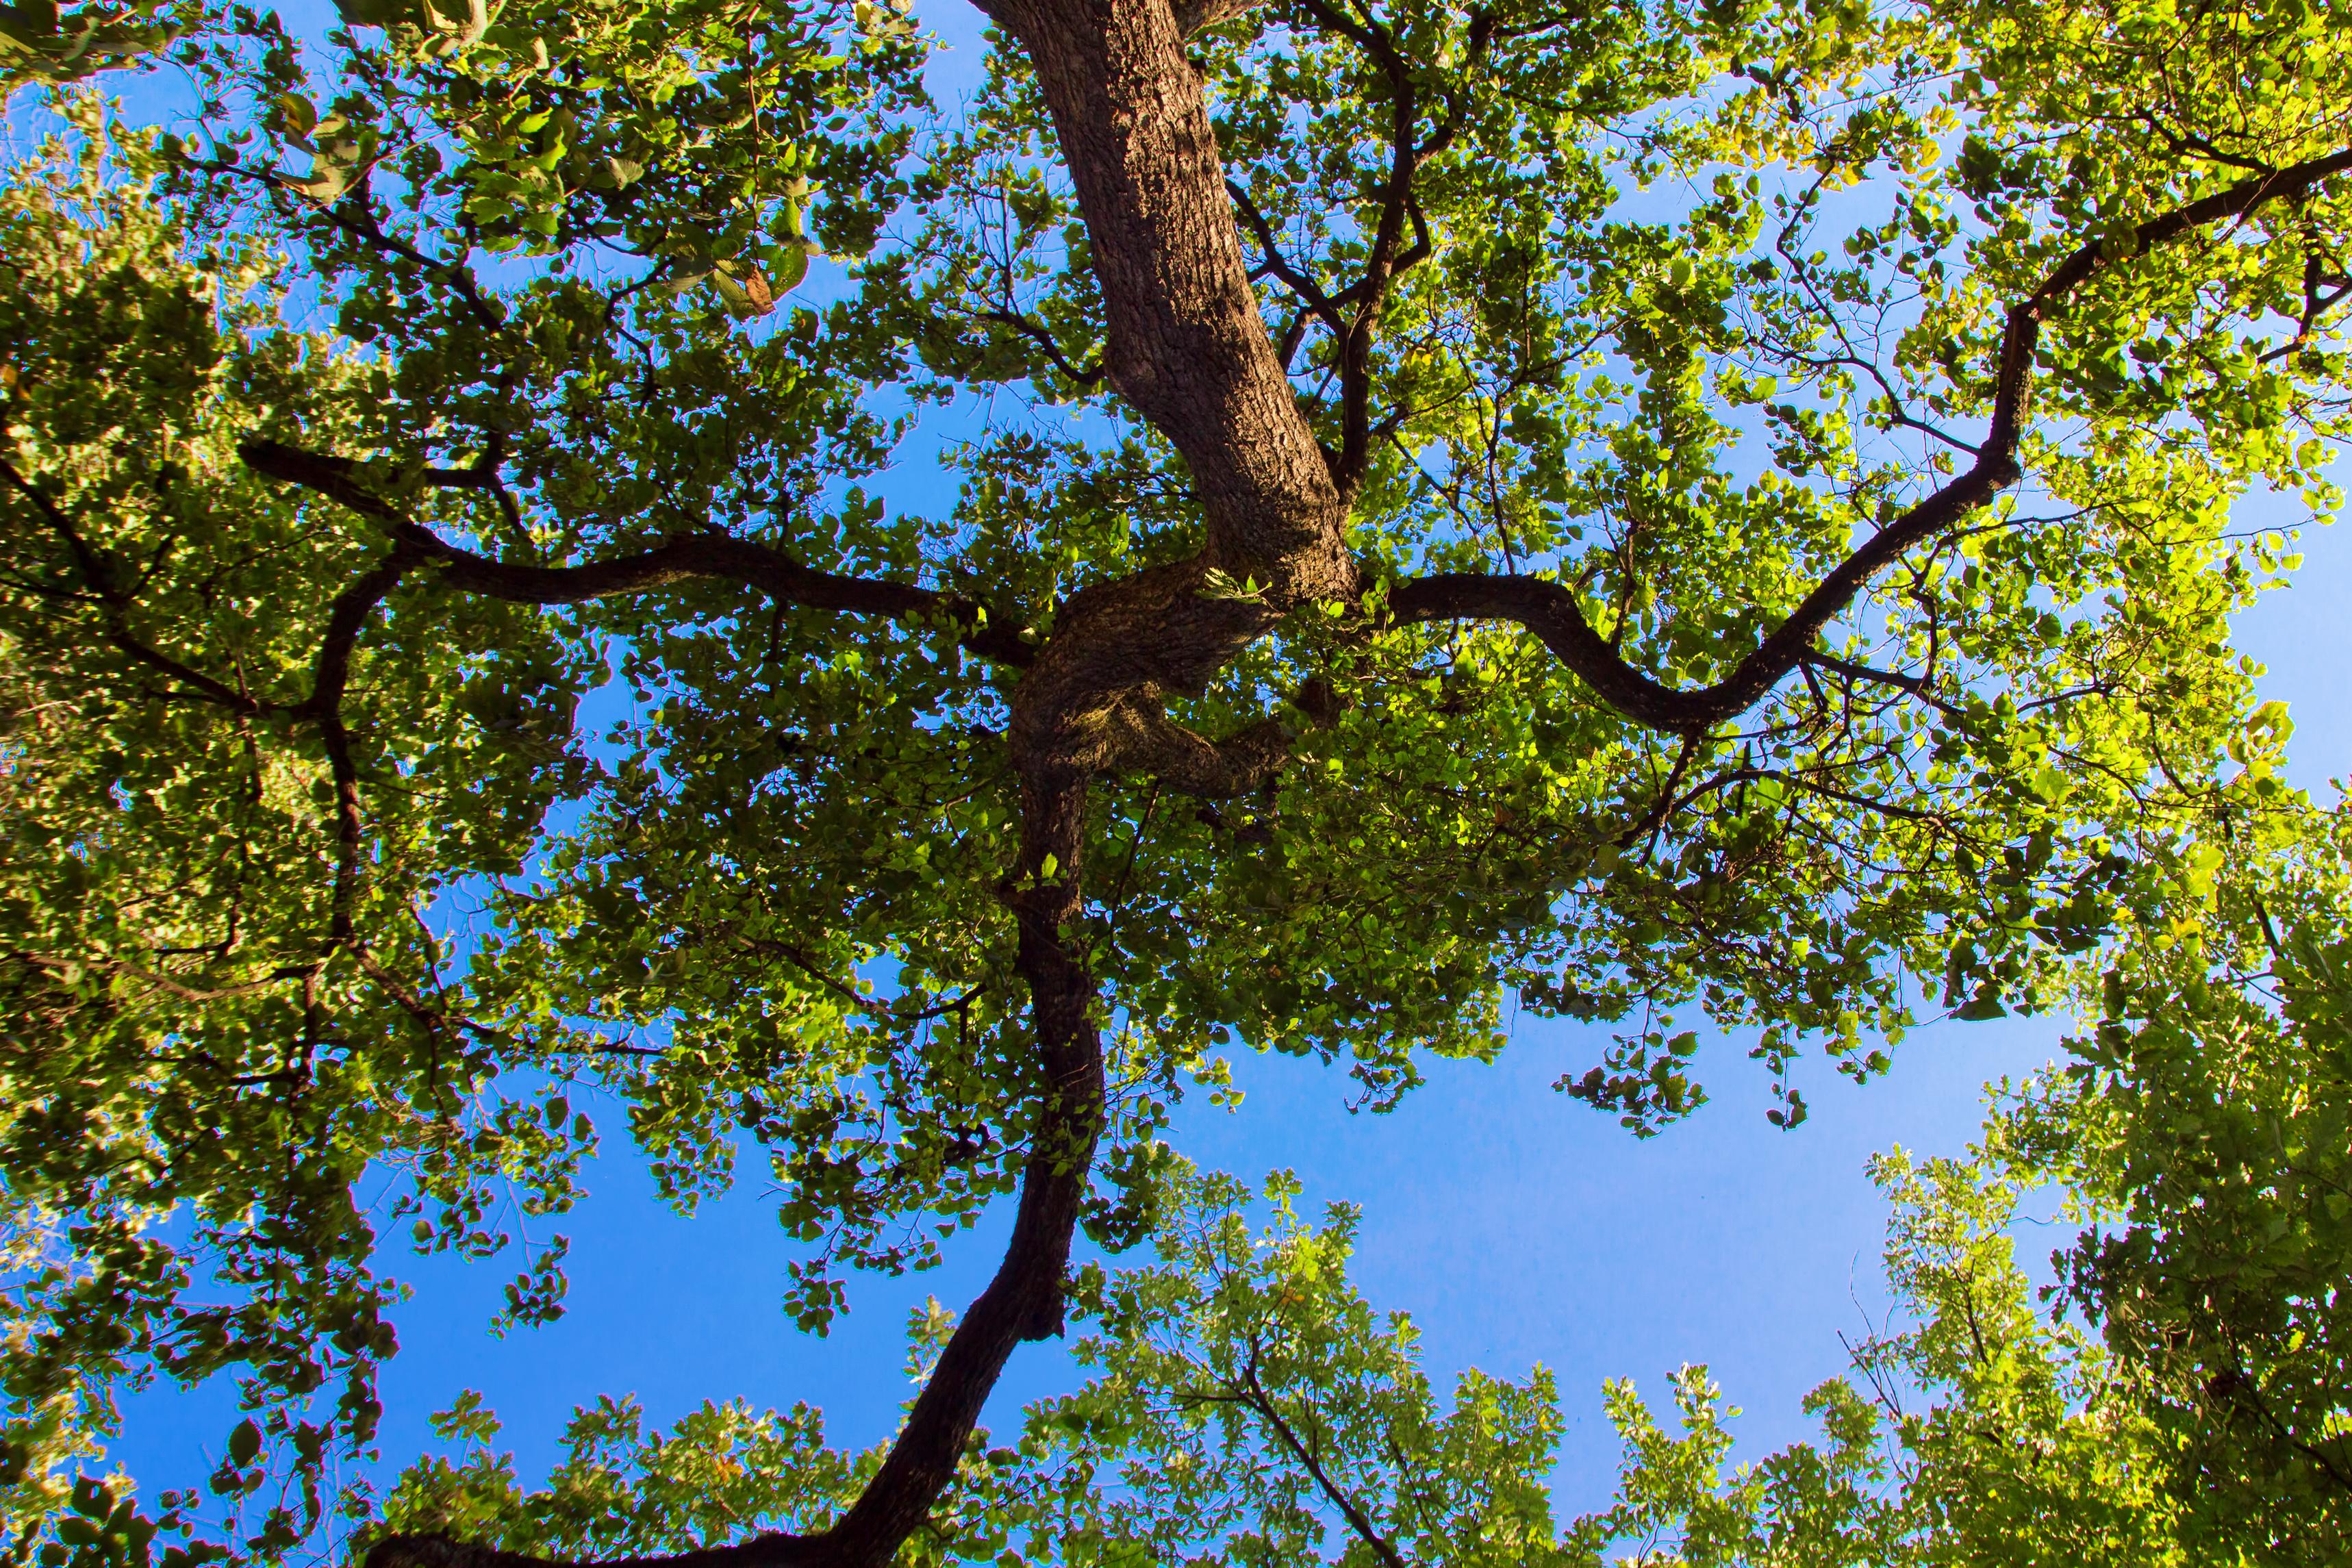 Tree, Wallpaper, Shine, Plants, Quiet, HQ Photo